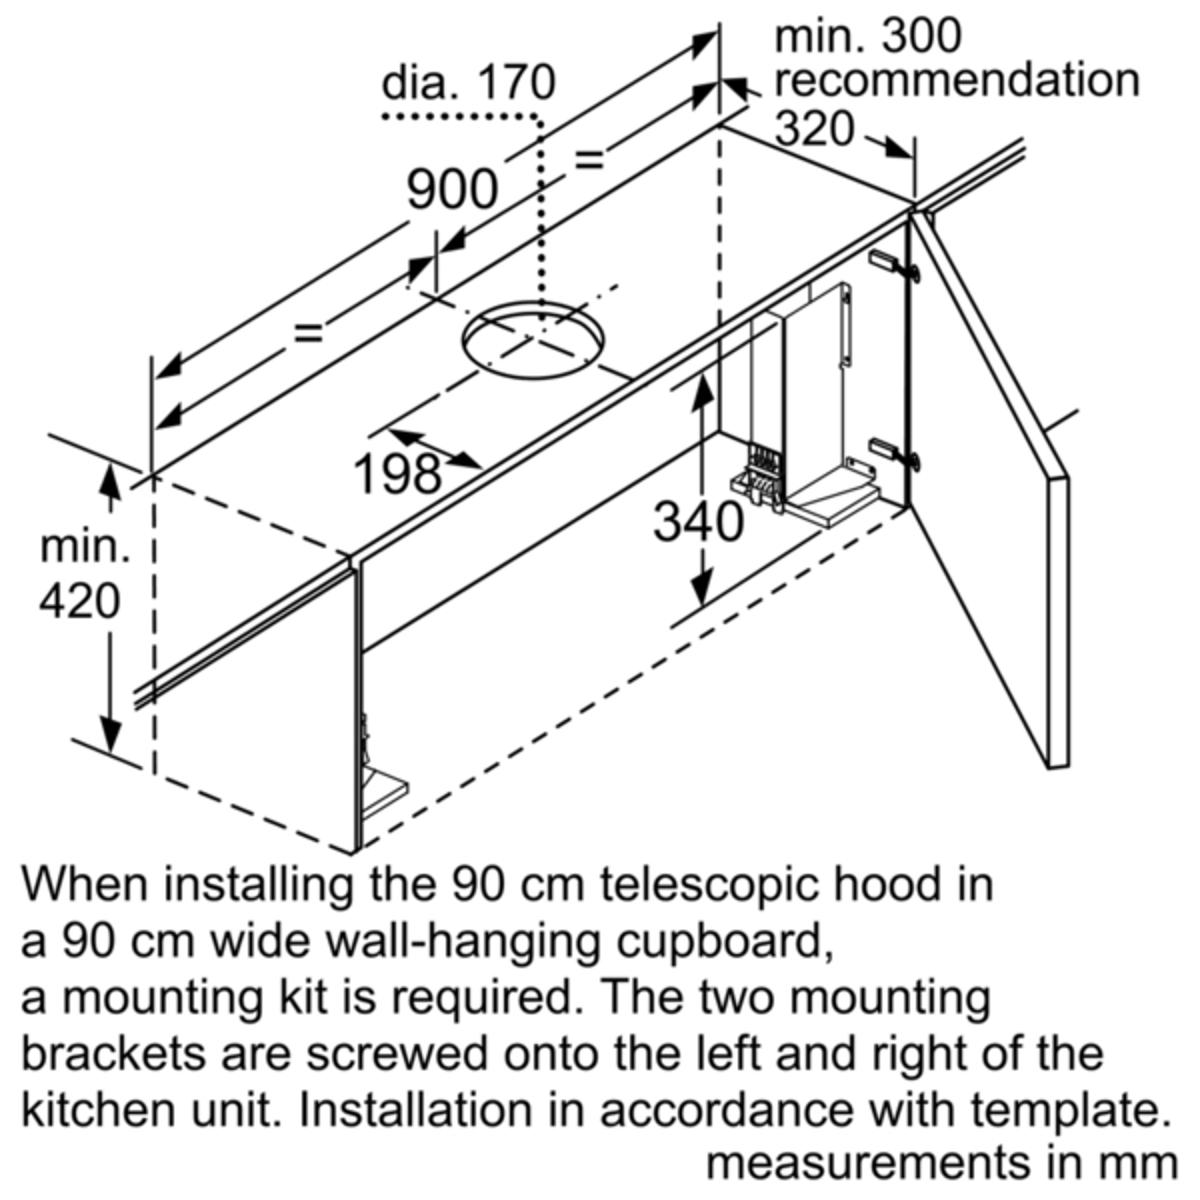 Neff D49ml54n0b Telescopic Hood 90 Cm Wide